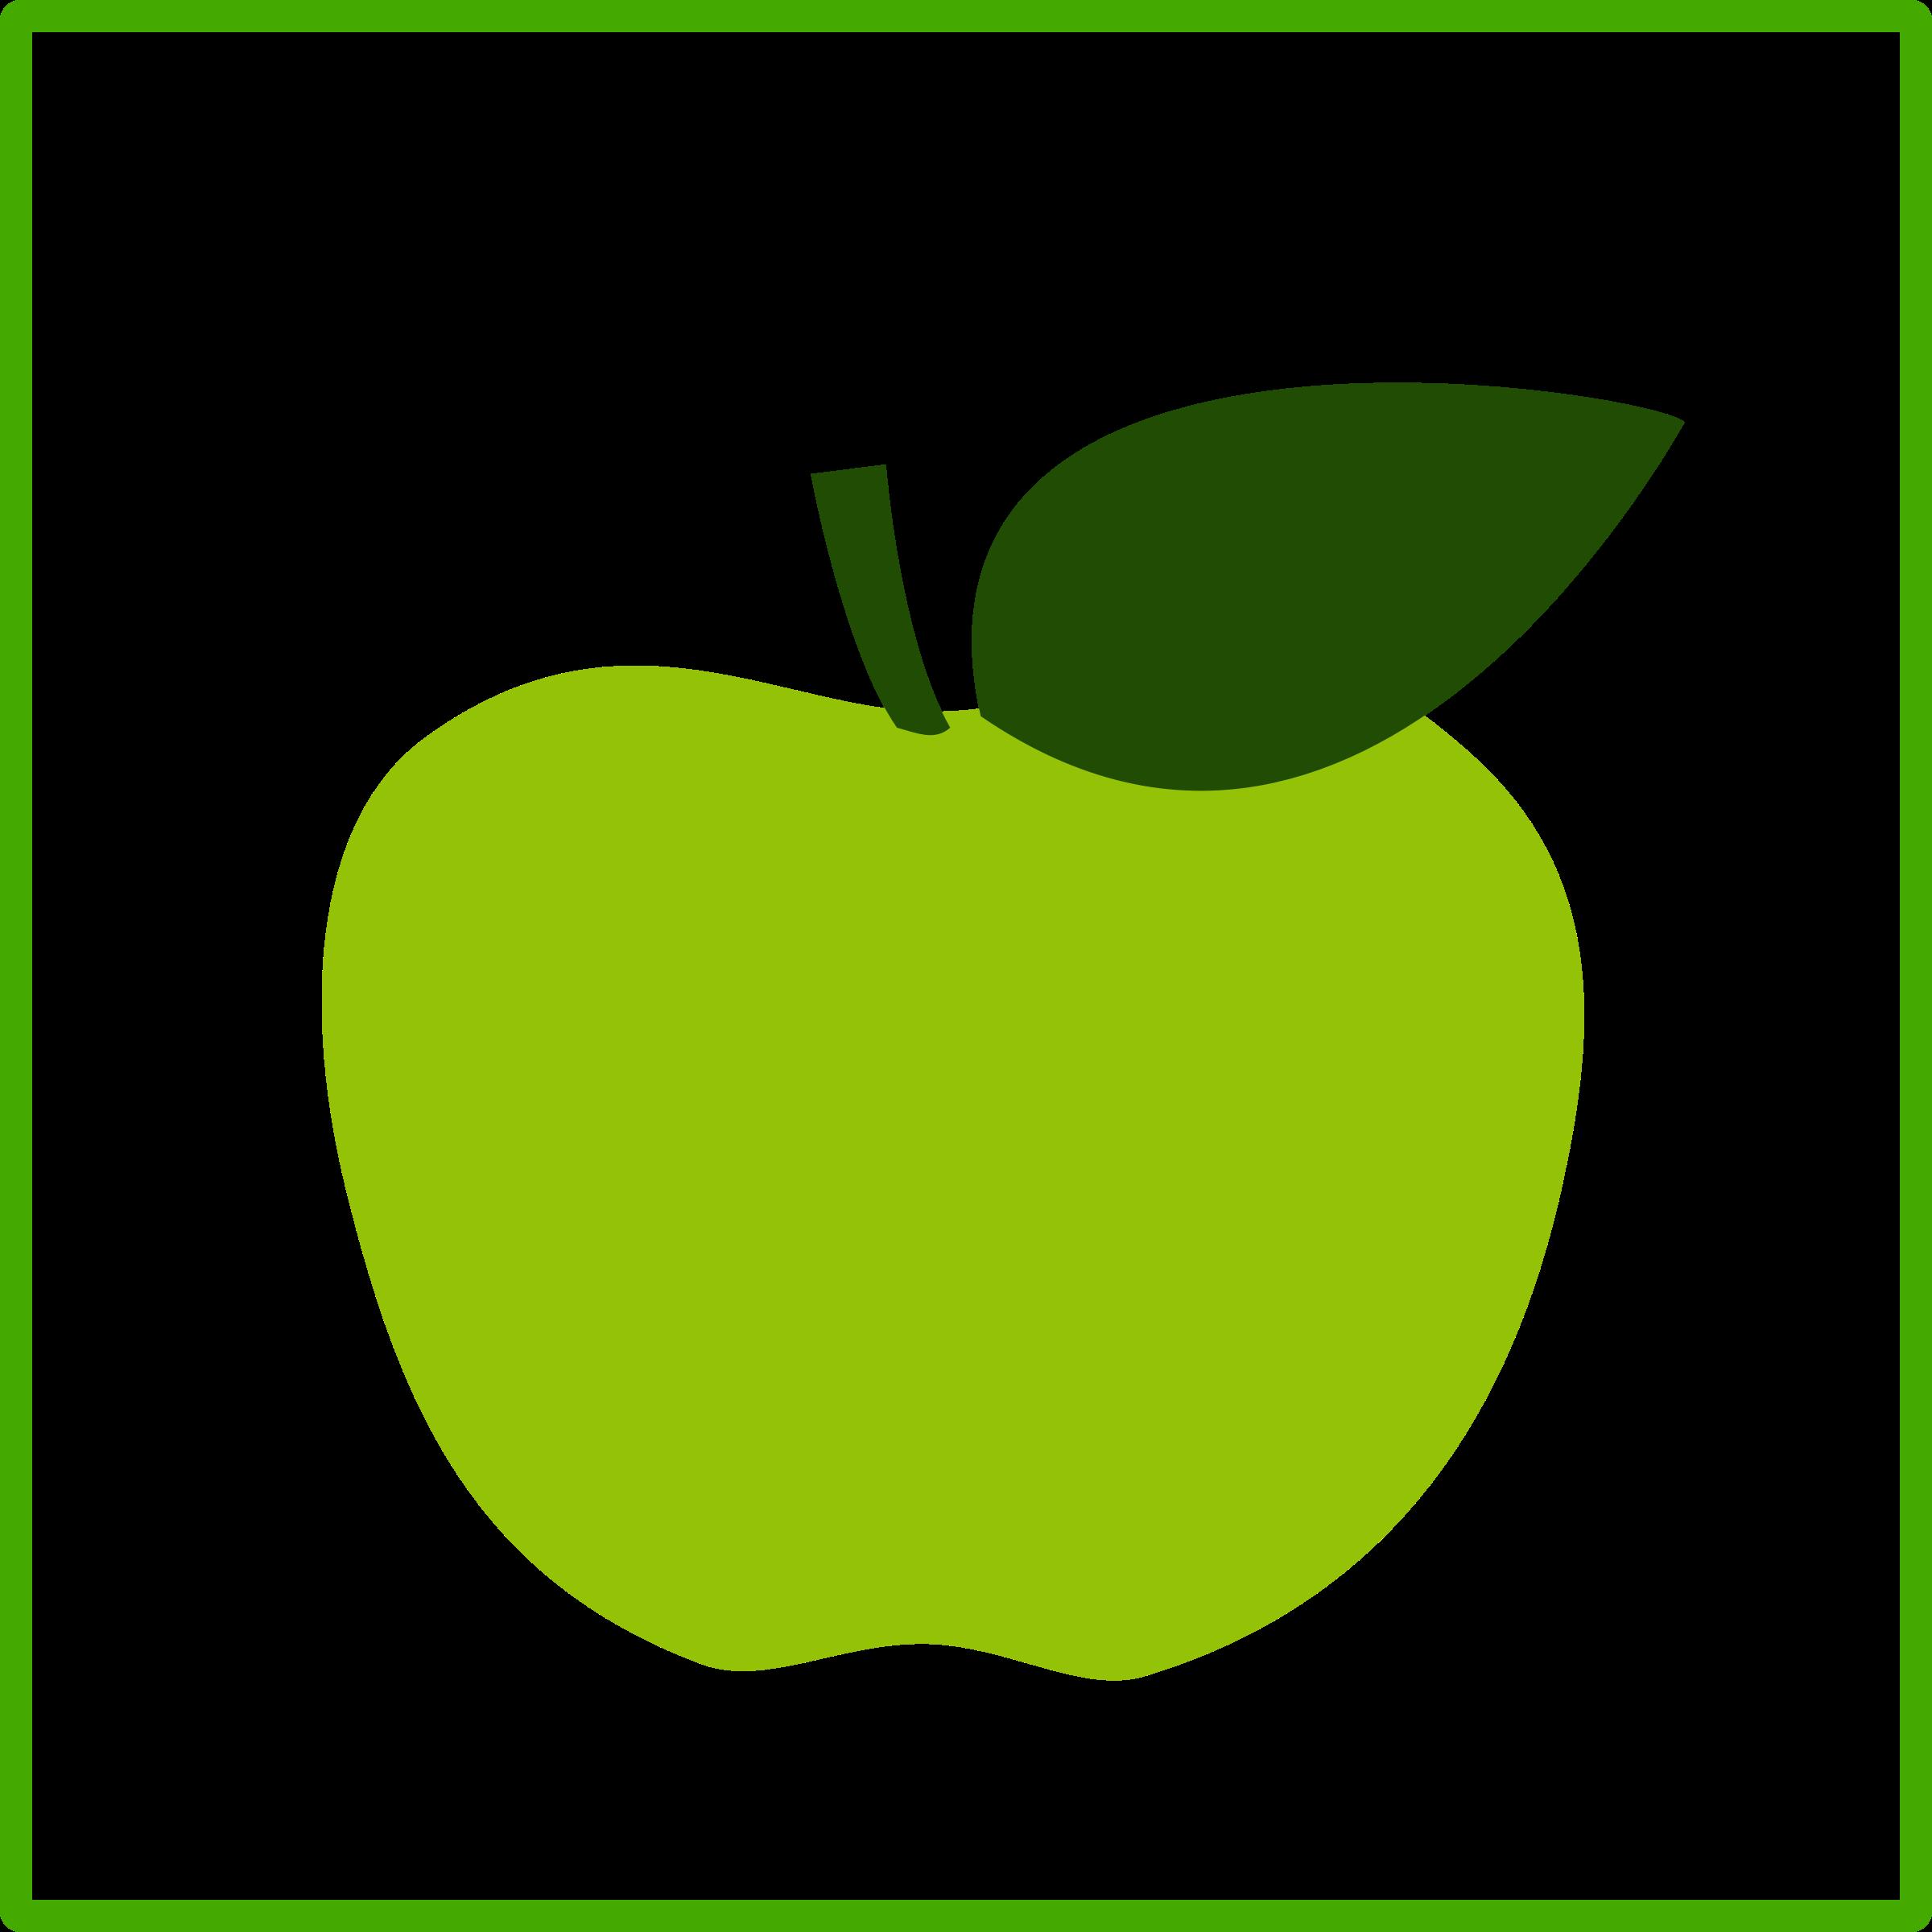 Apple Icon Transparent Png BIG IMAGE (PNG)...